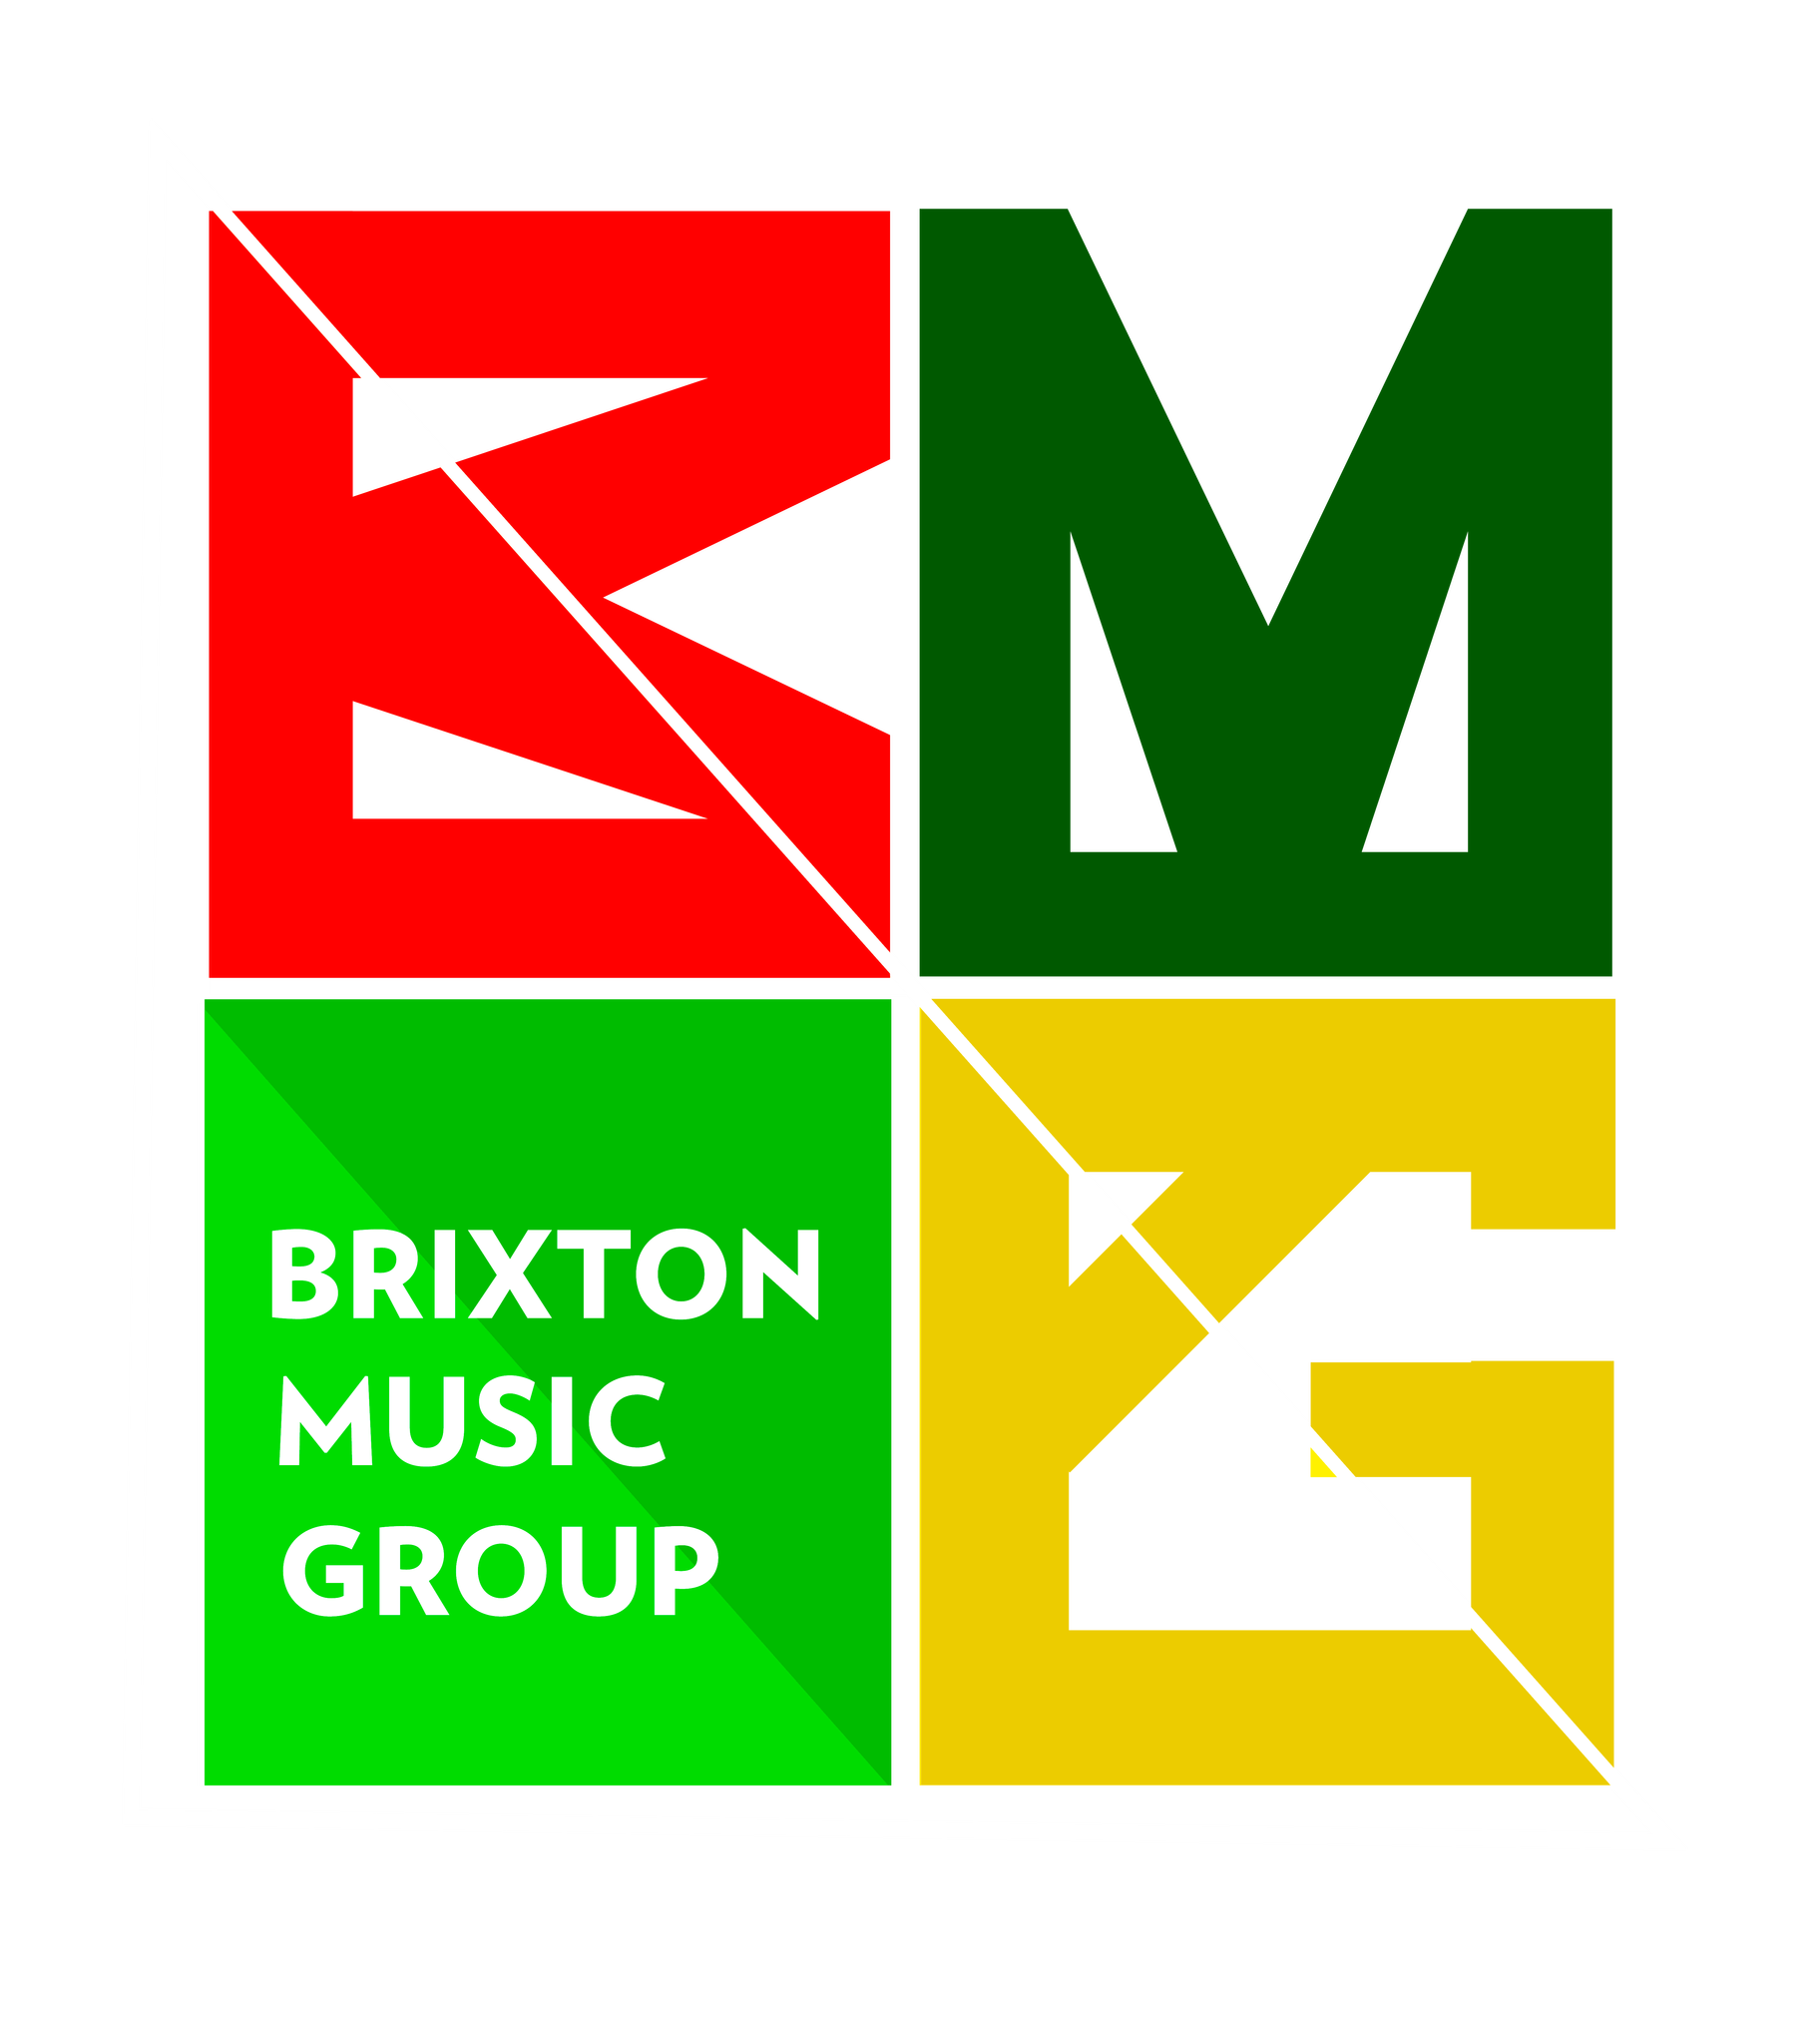 brixton-music-group-Logo